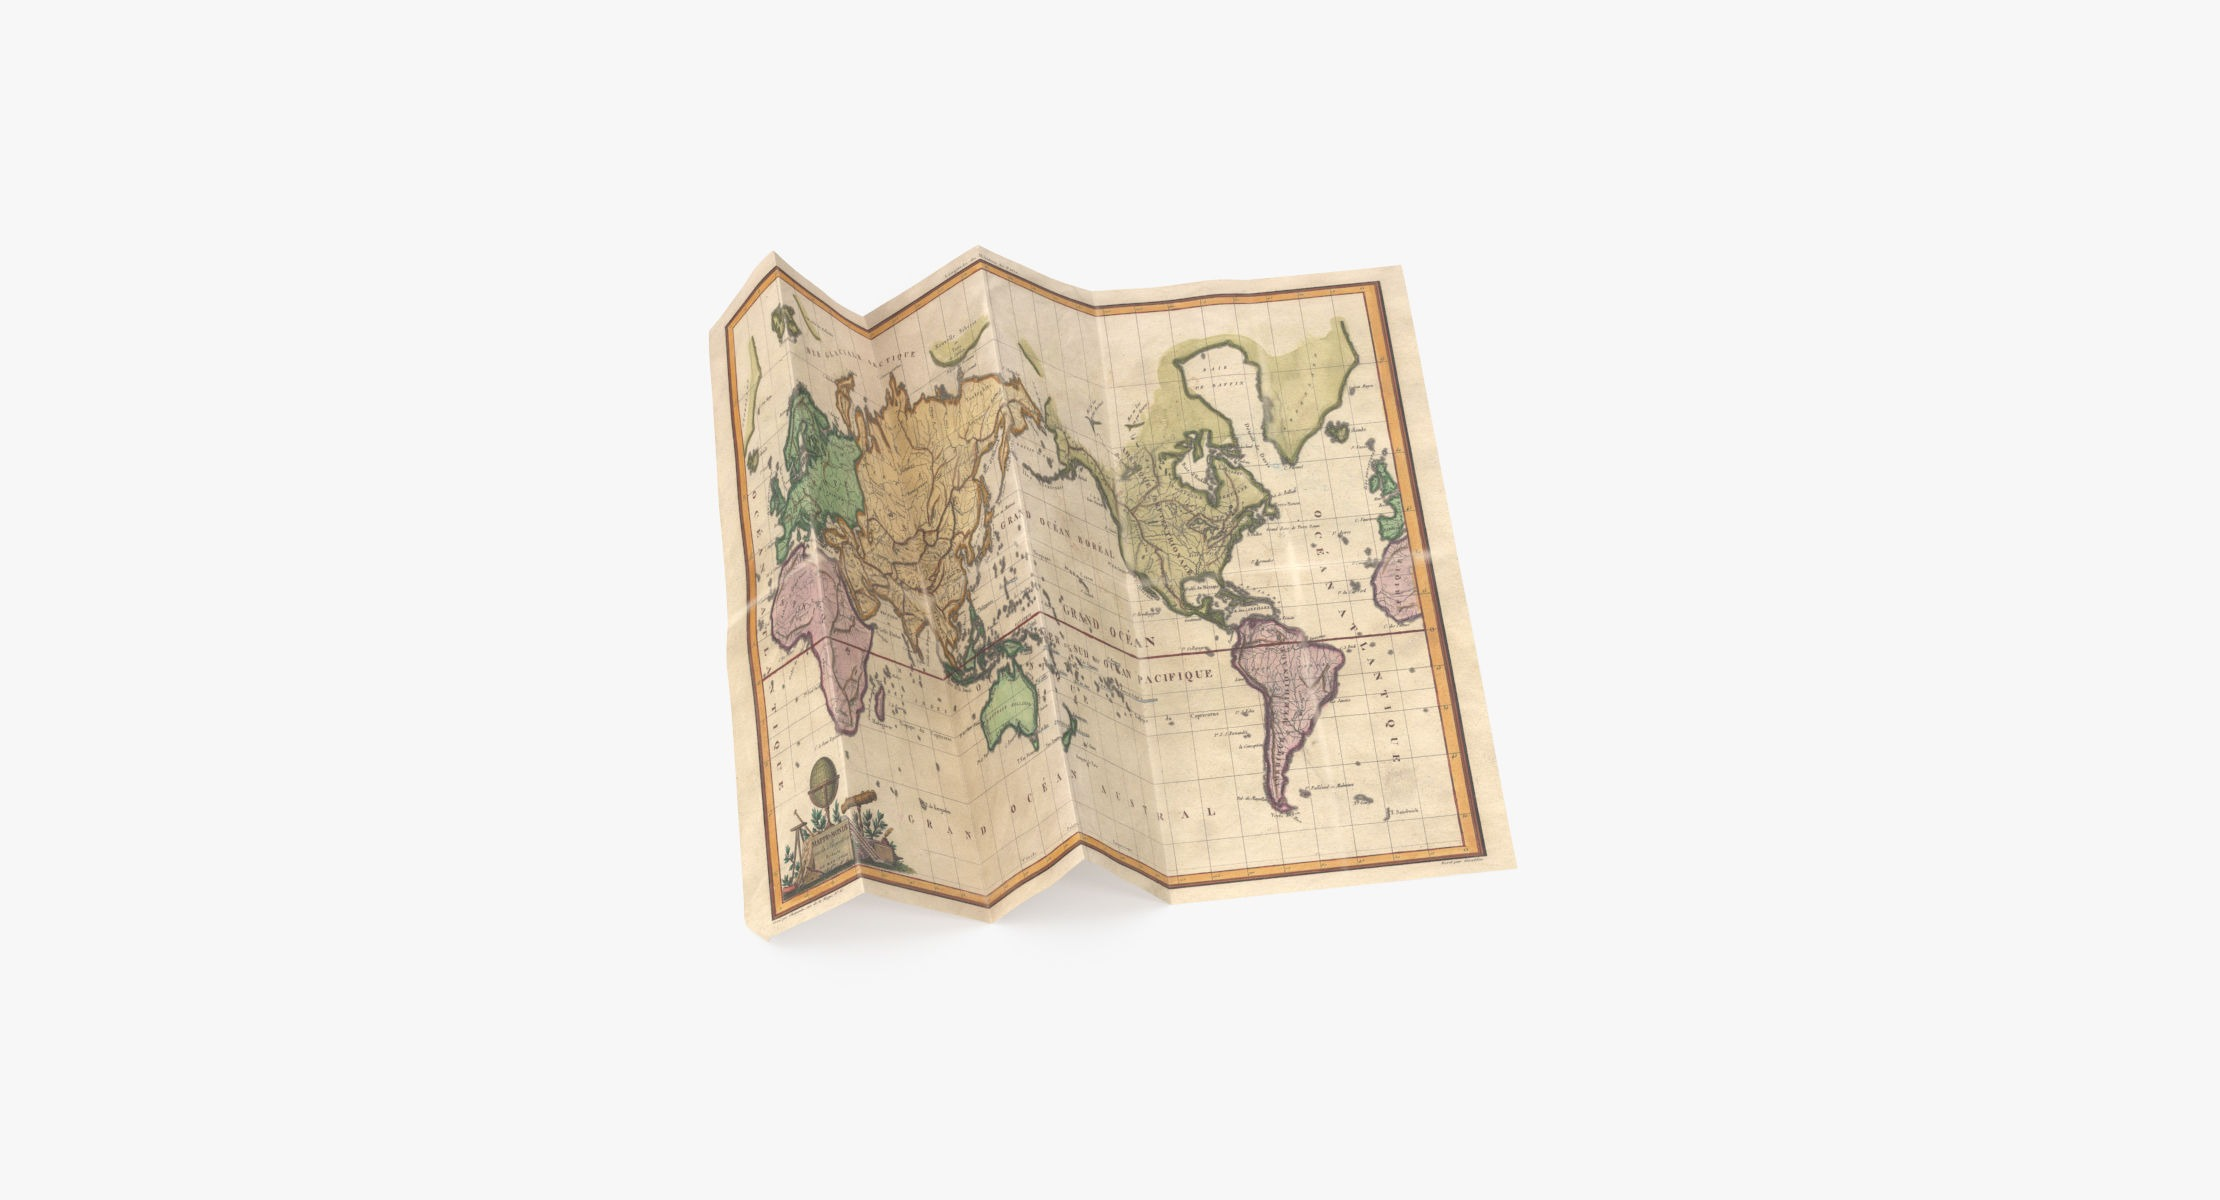 Retro Map 03 02 - reel 1